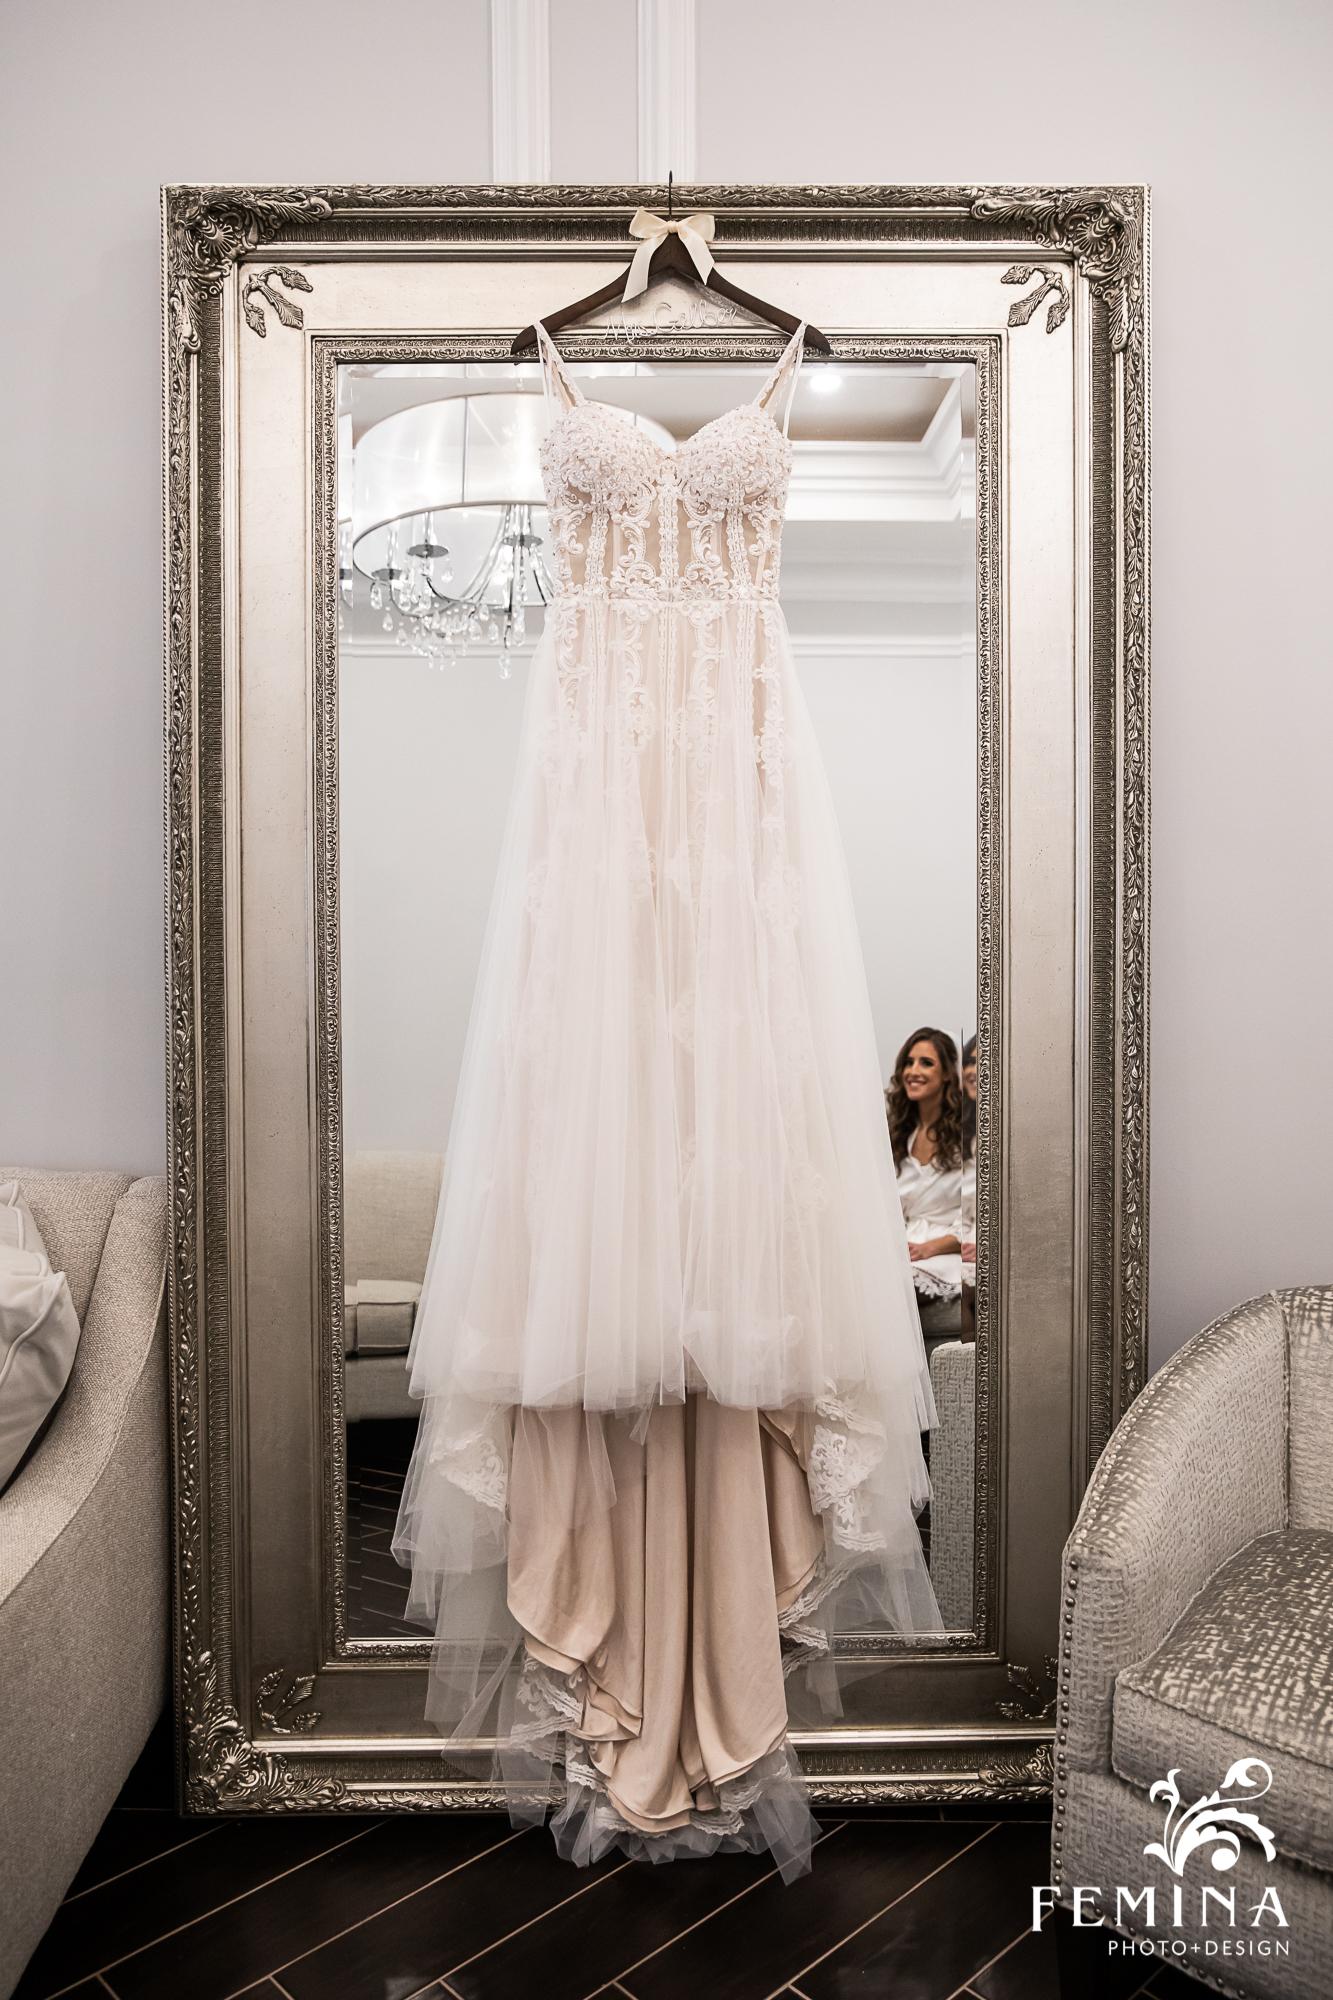 Bride's wedding dress hanging on a mirror